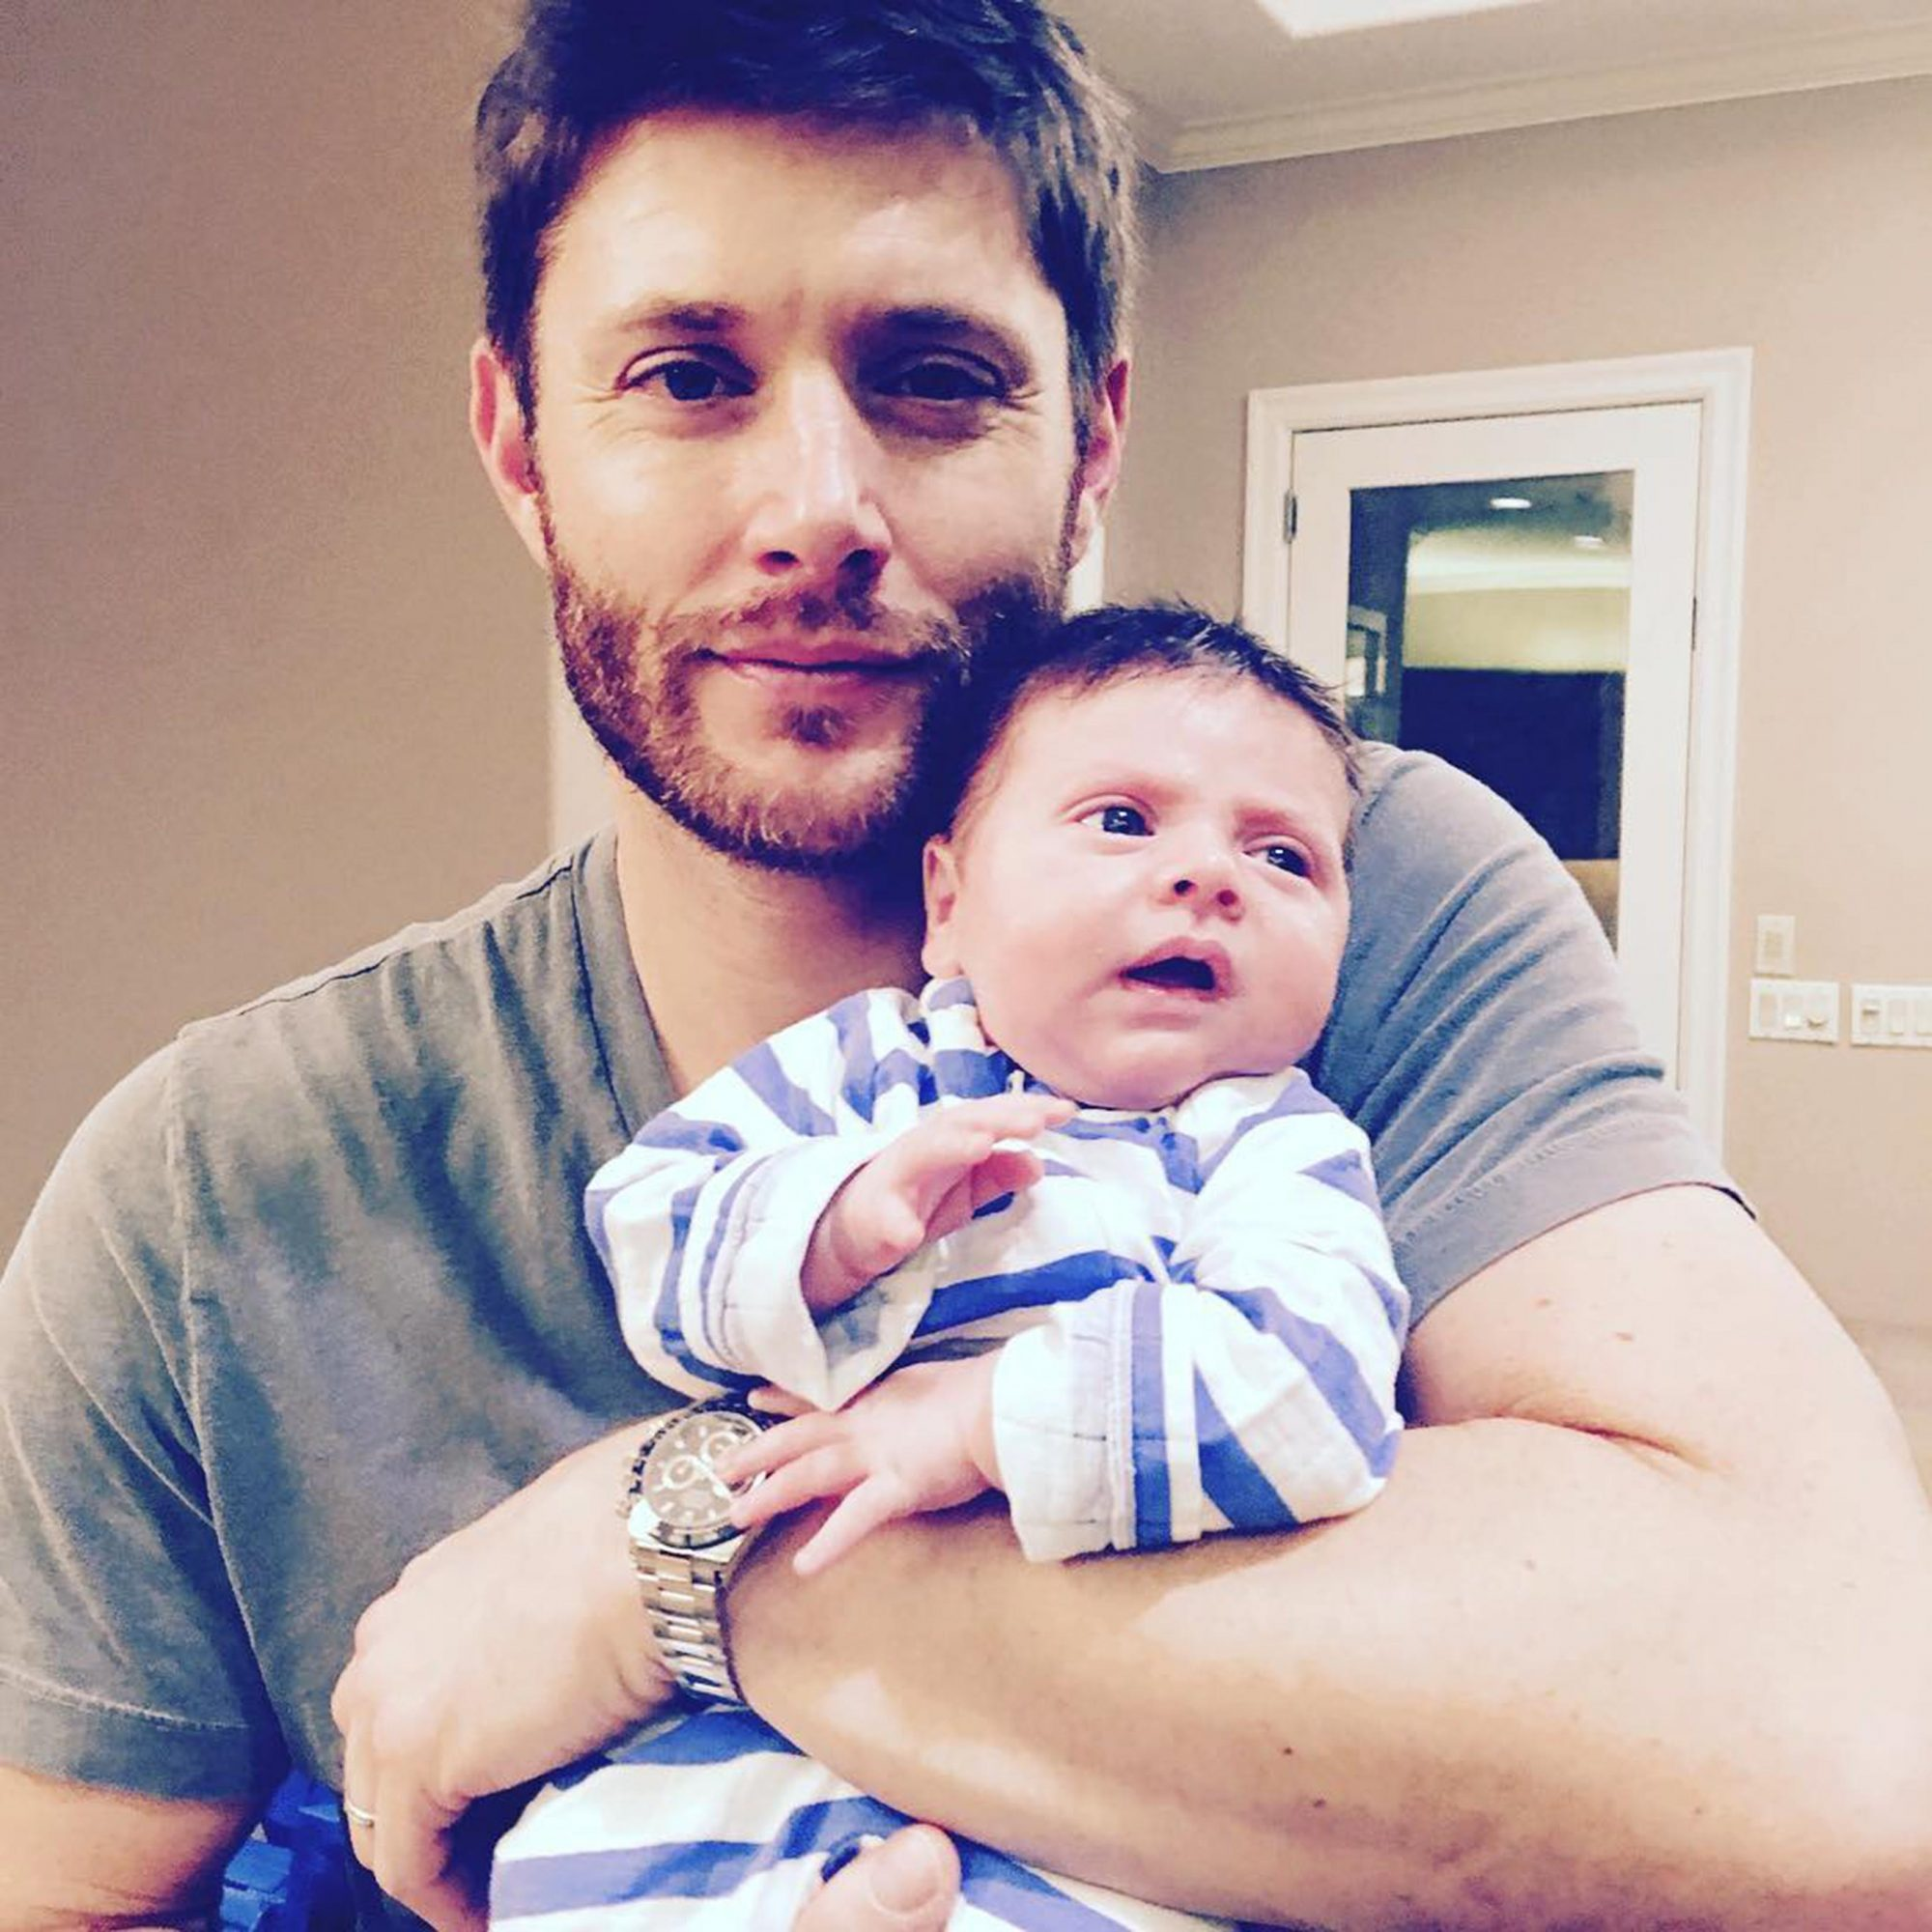 Jensen Ackles Instagram